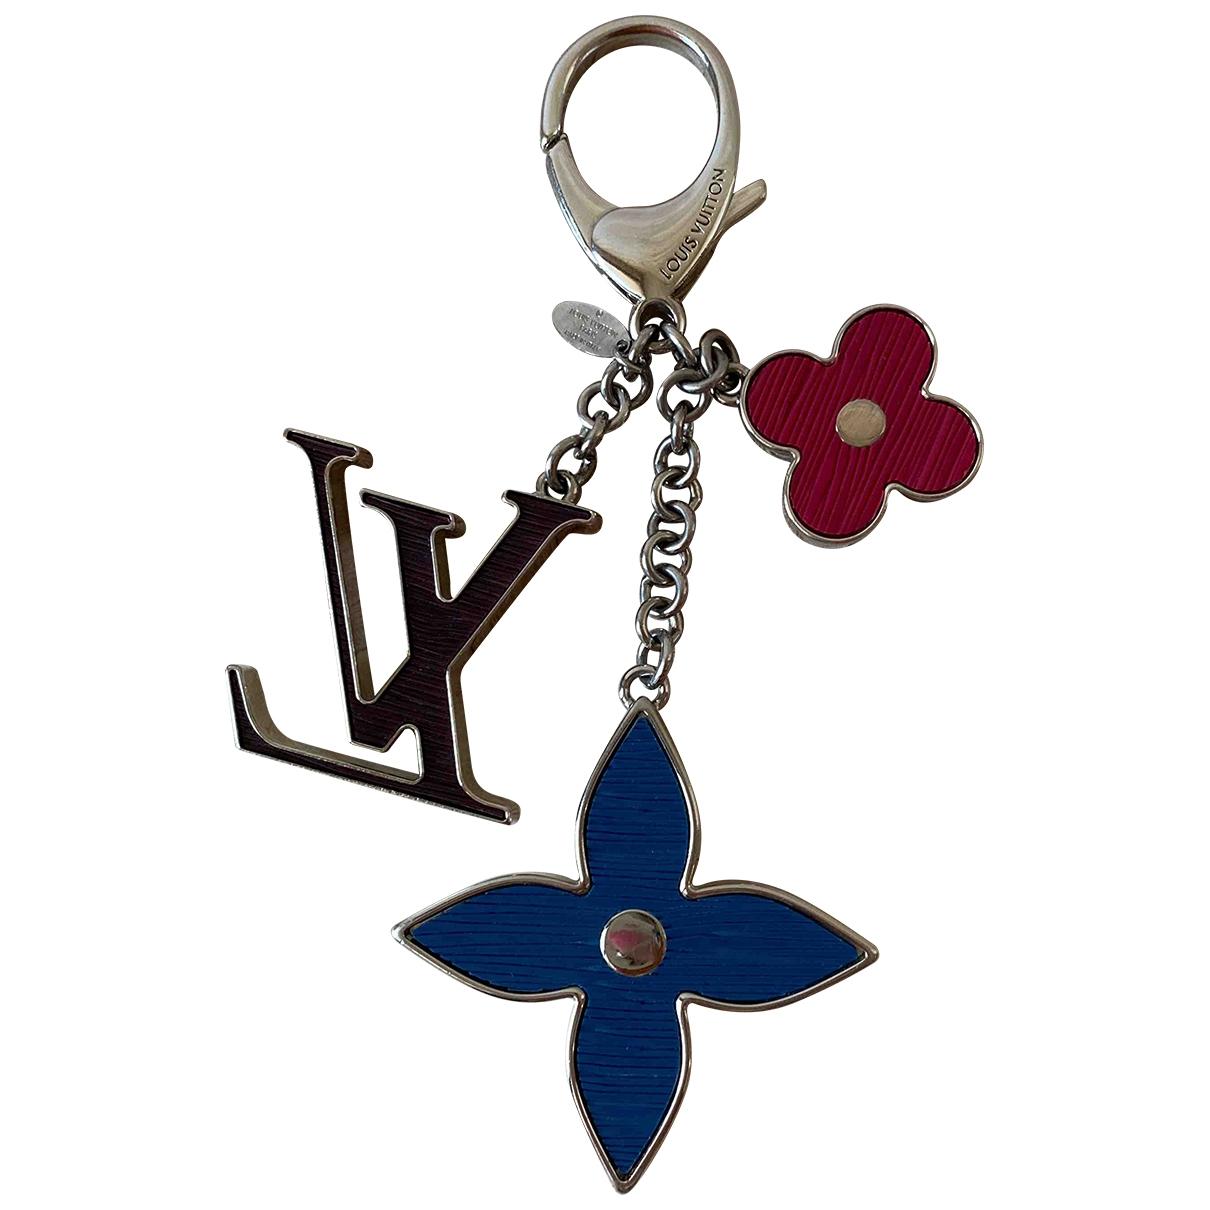 Louis Vuitton \N Taschenschmuck in  Bunt Metall